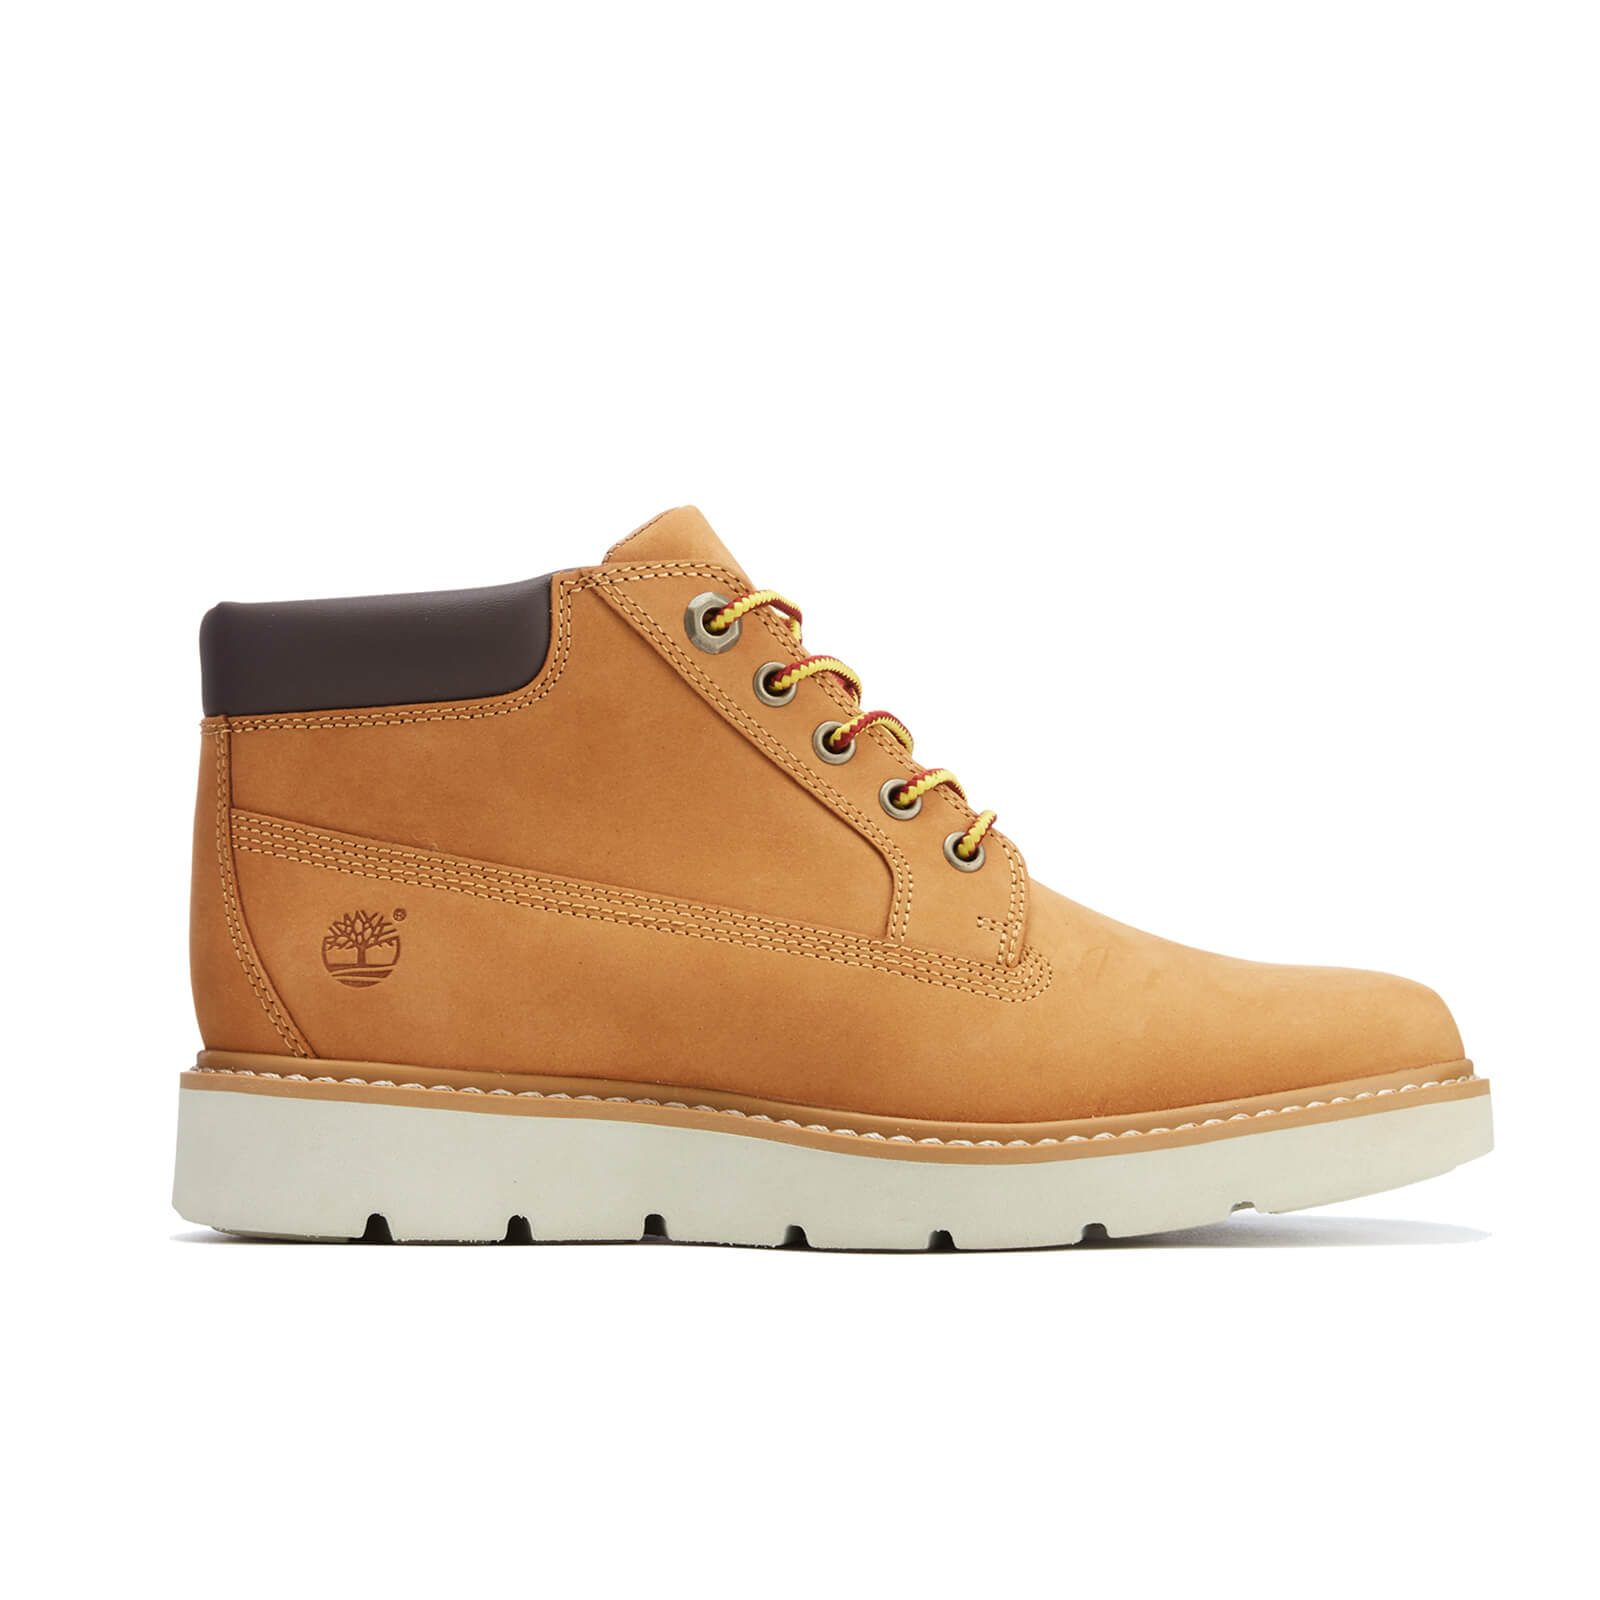 9fd67fc1e03b Timberland Women s Kenniston Nellie Lace Up Boots - Wheat Womens Footwear